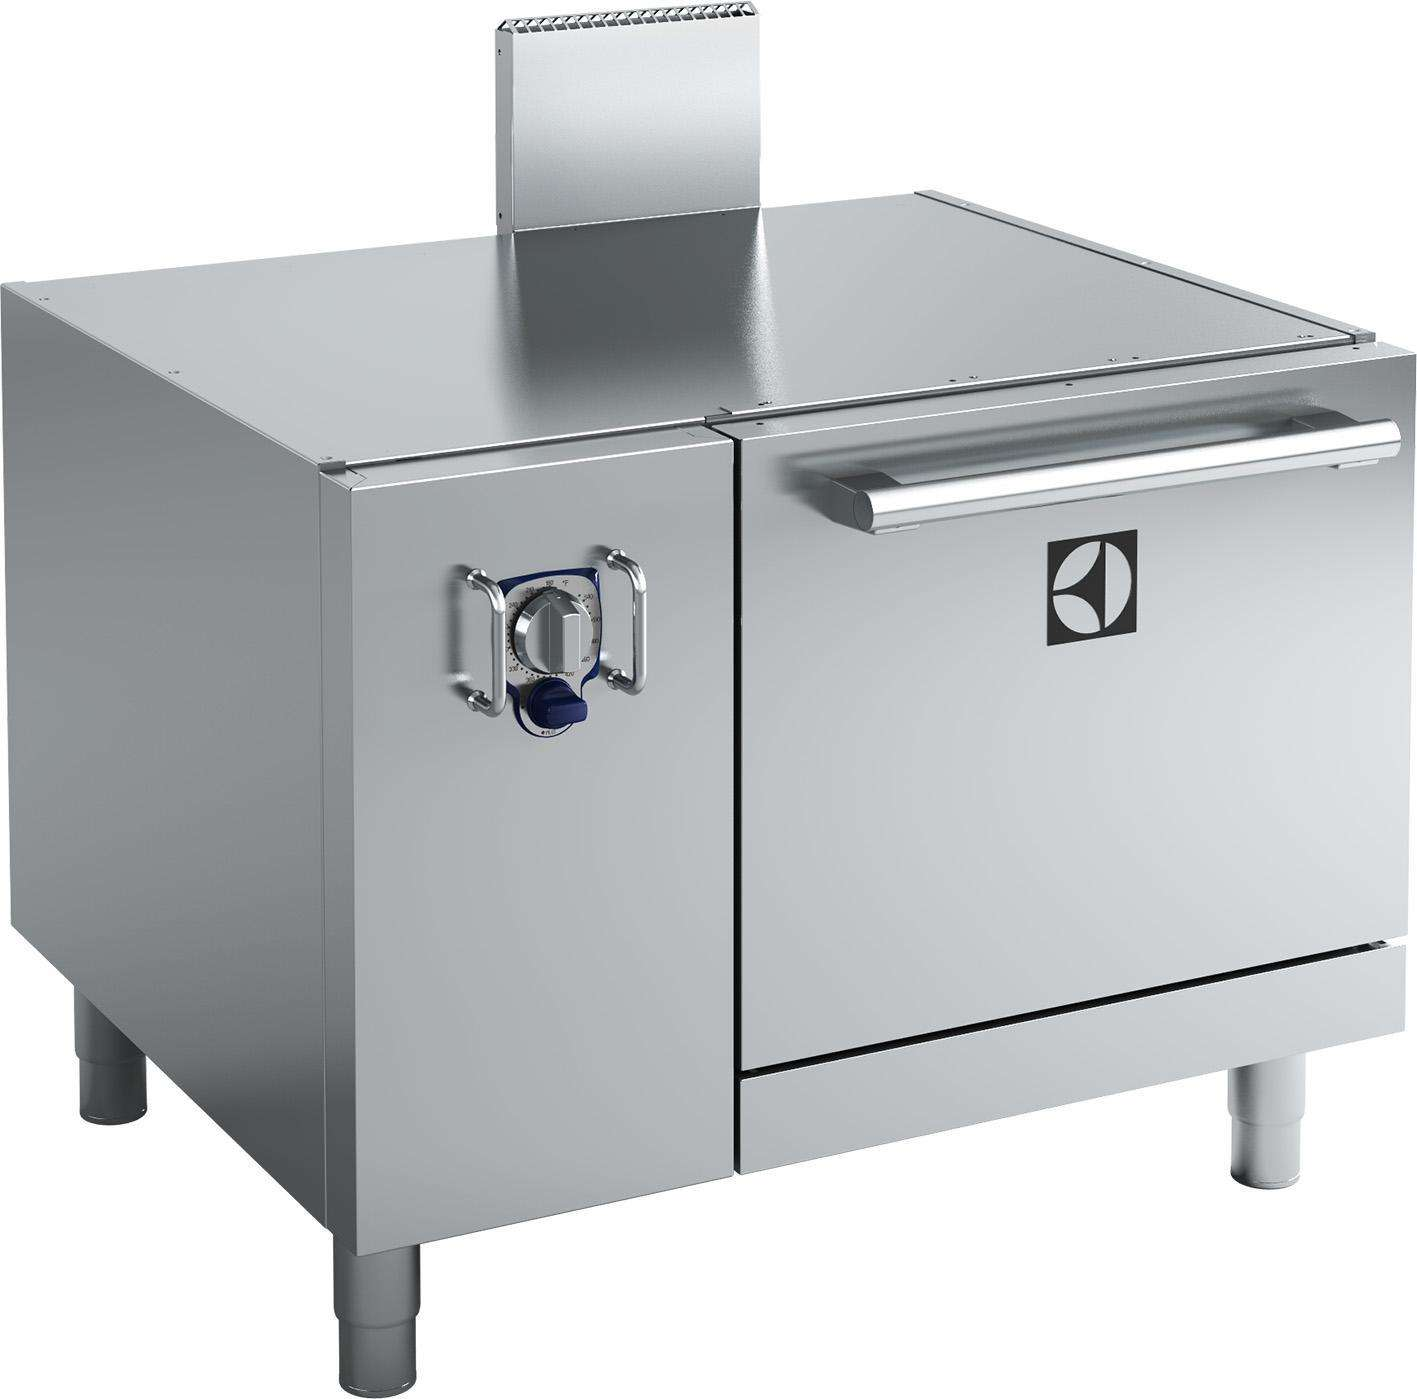 Restaurant Kitchen Cove Base: Electrolux Professional 169152 (AFG36) EMPower